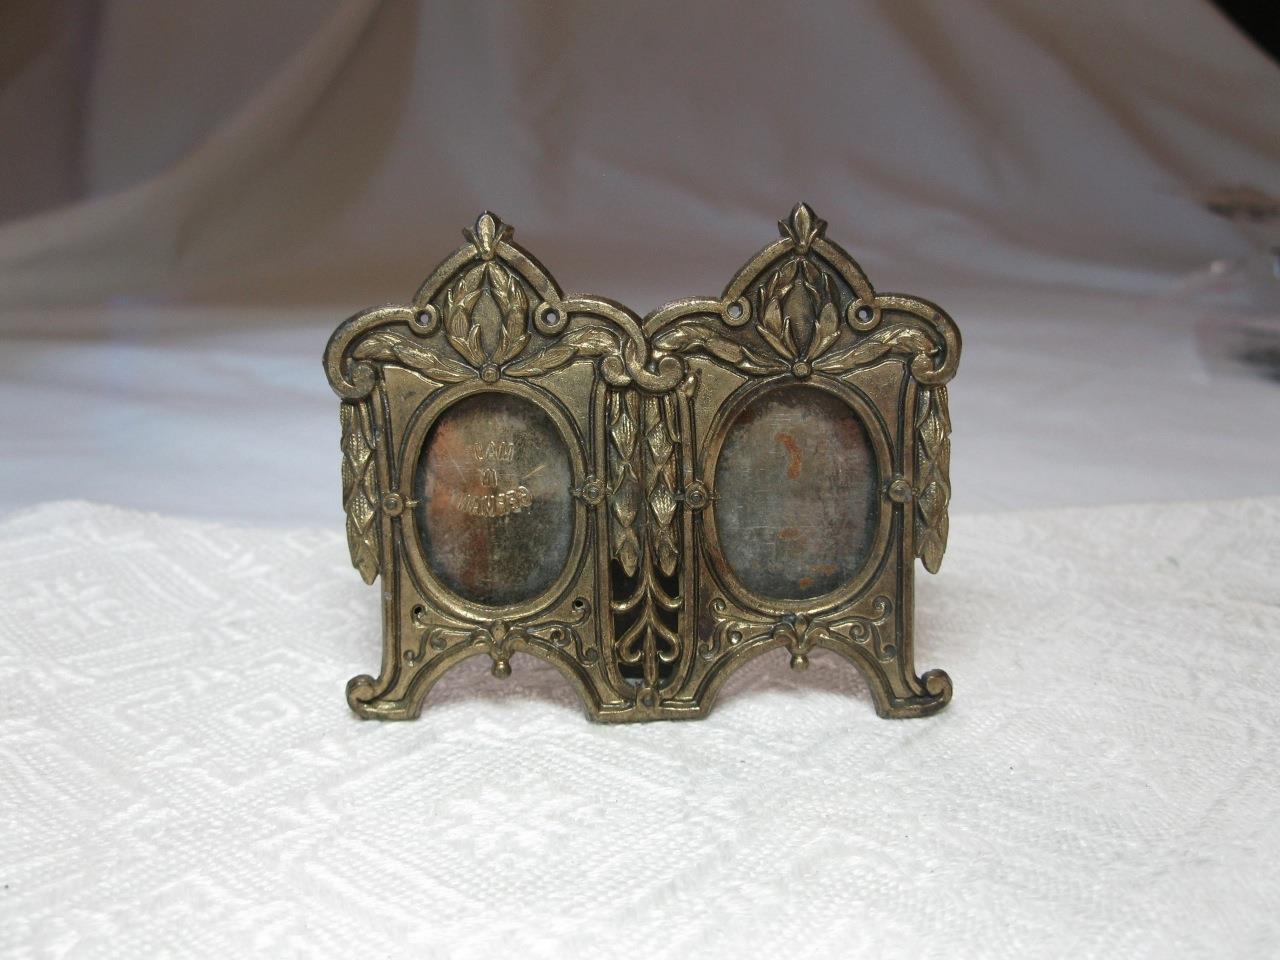 Antike Miniatur Doppelt Bilderrahmen Germany Ormolu VerGoldet C1900 Puppenhaus